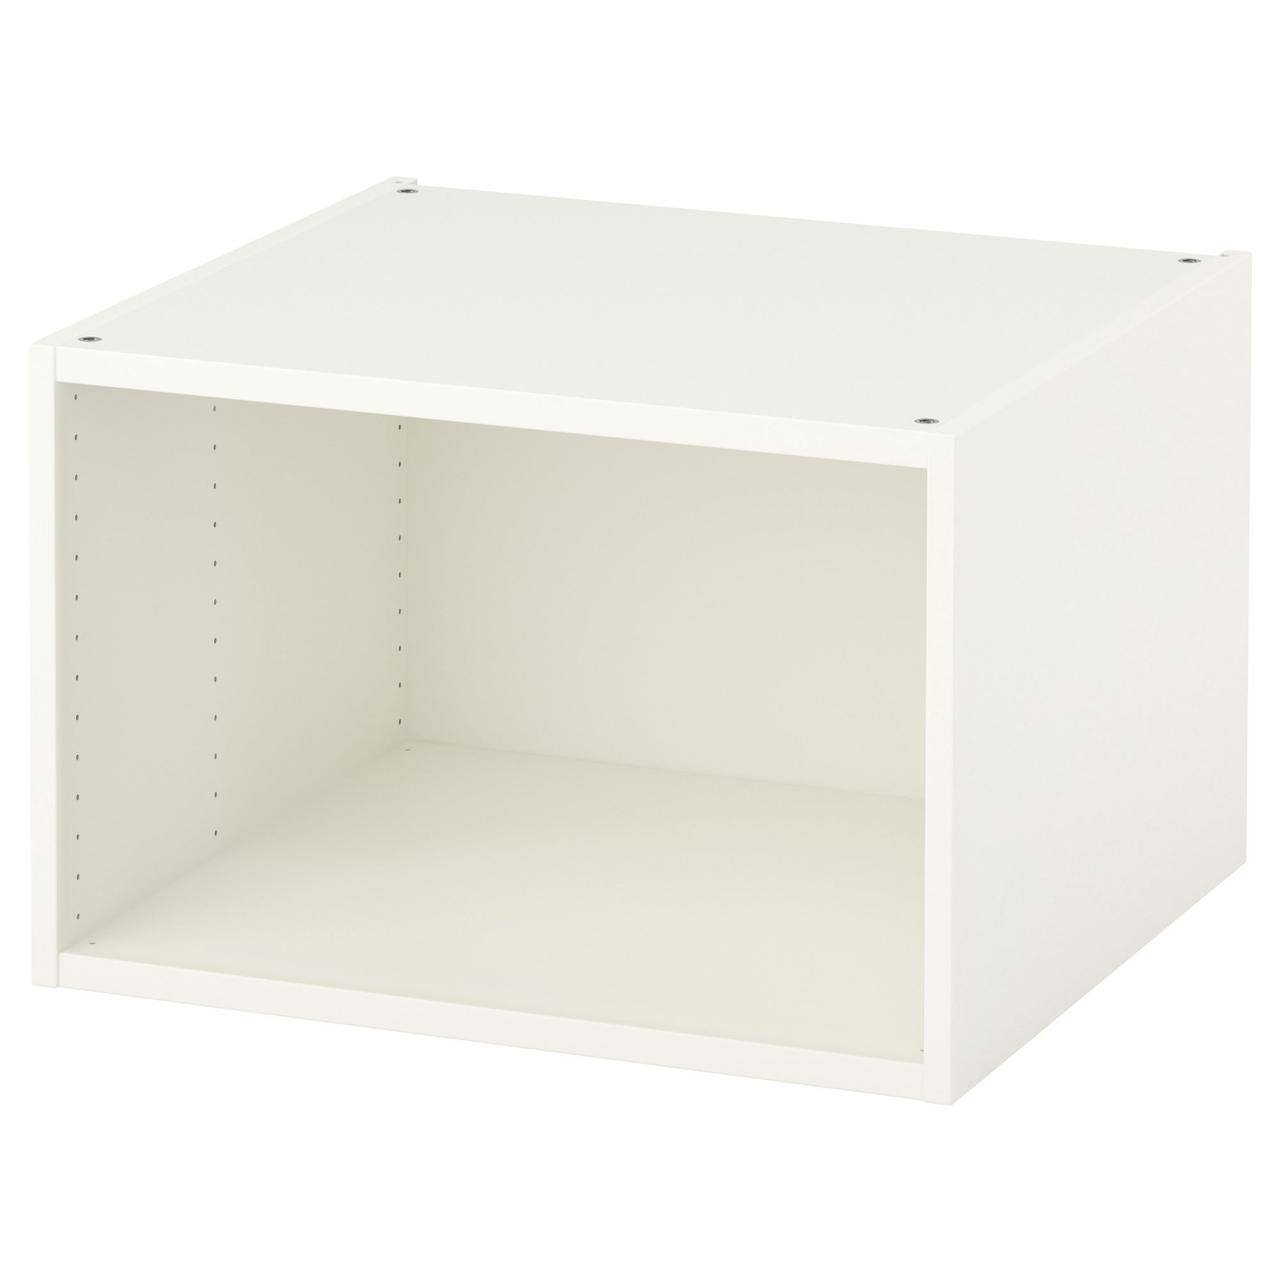 Каркас IKEA PLATSA белый 60x55x40 см 903.309.49